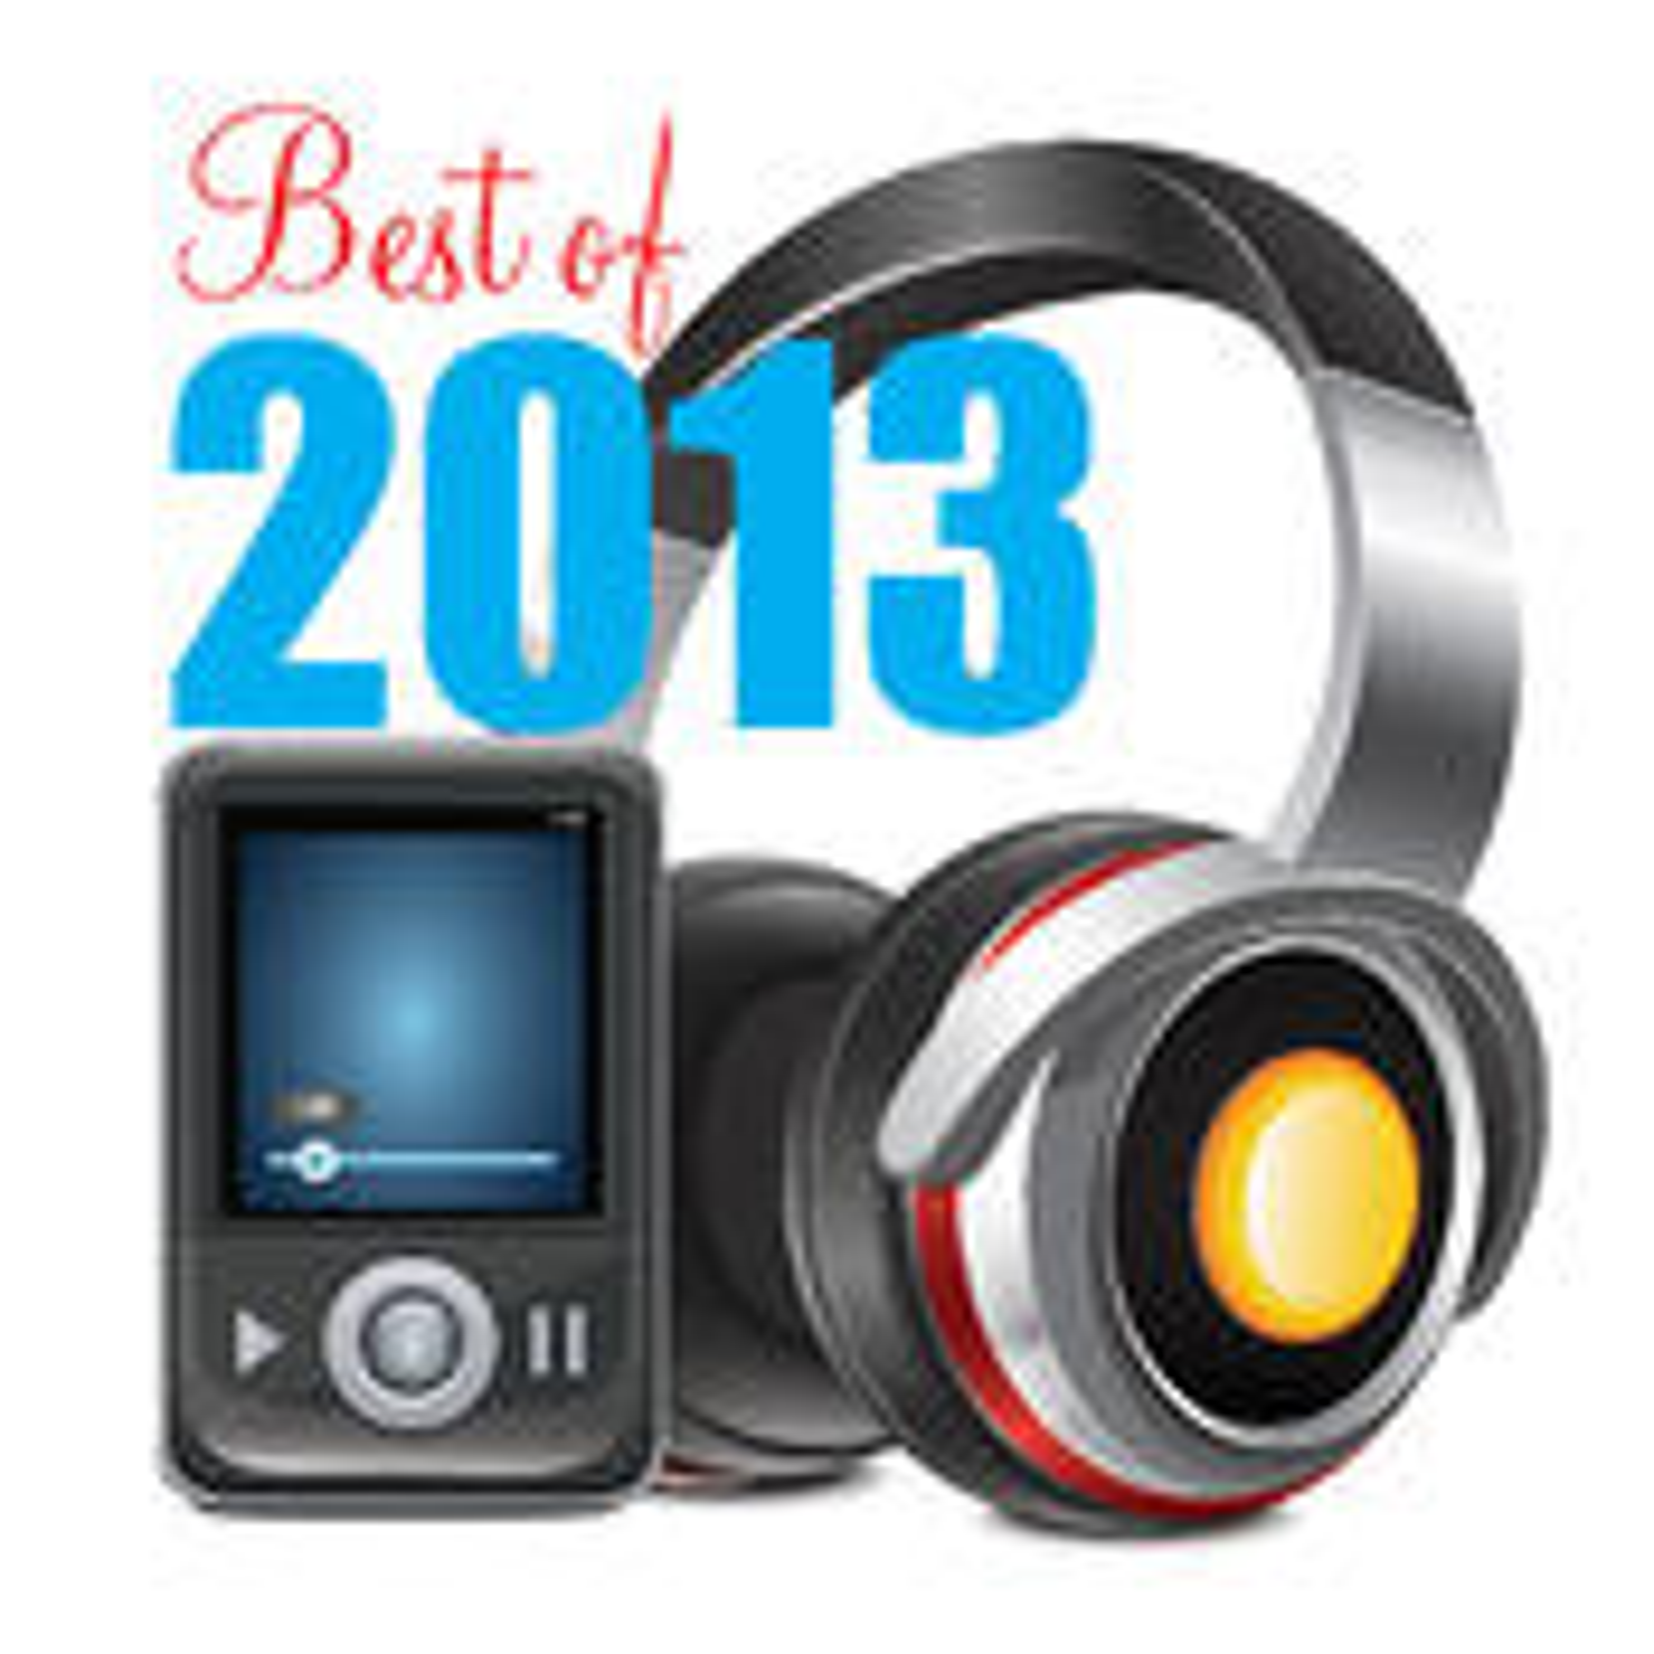 Best of Music 2013 blue